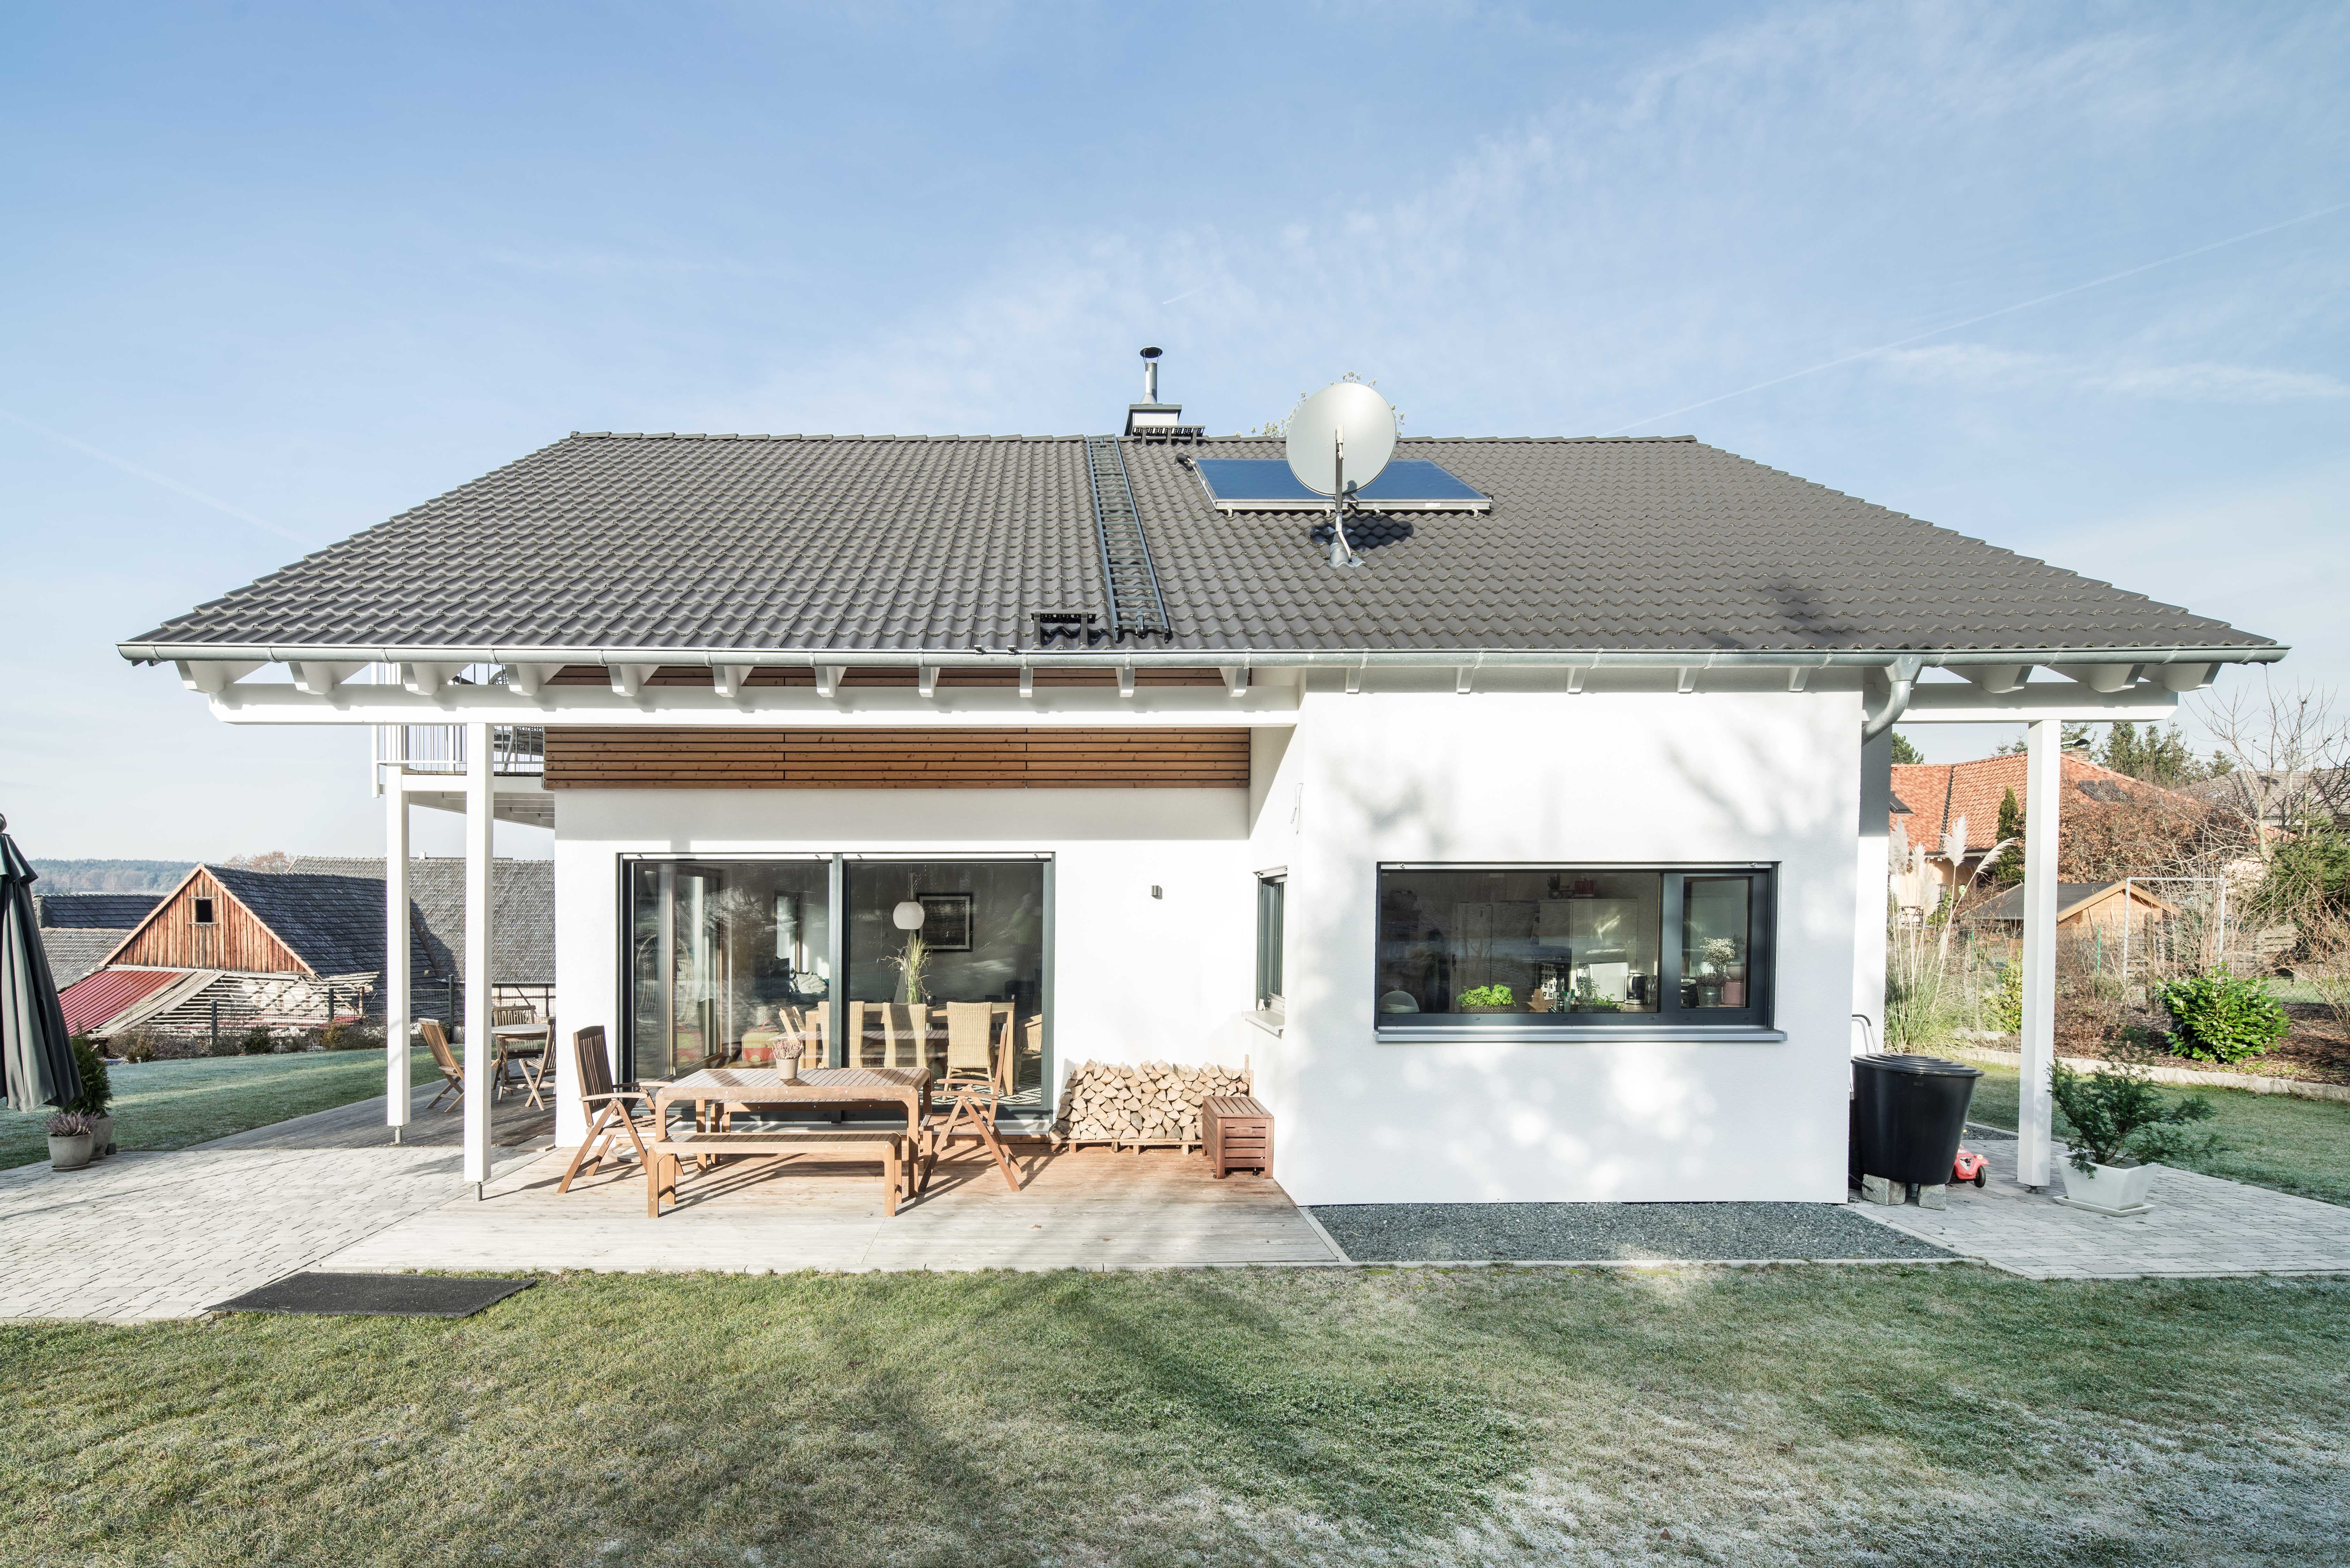 immobilien hochbau in schondra infobel deutschland. Black Bedroom Furniture Sets. Home Design Ideas